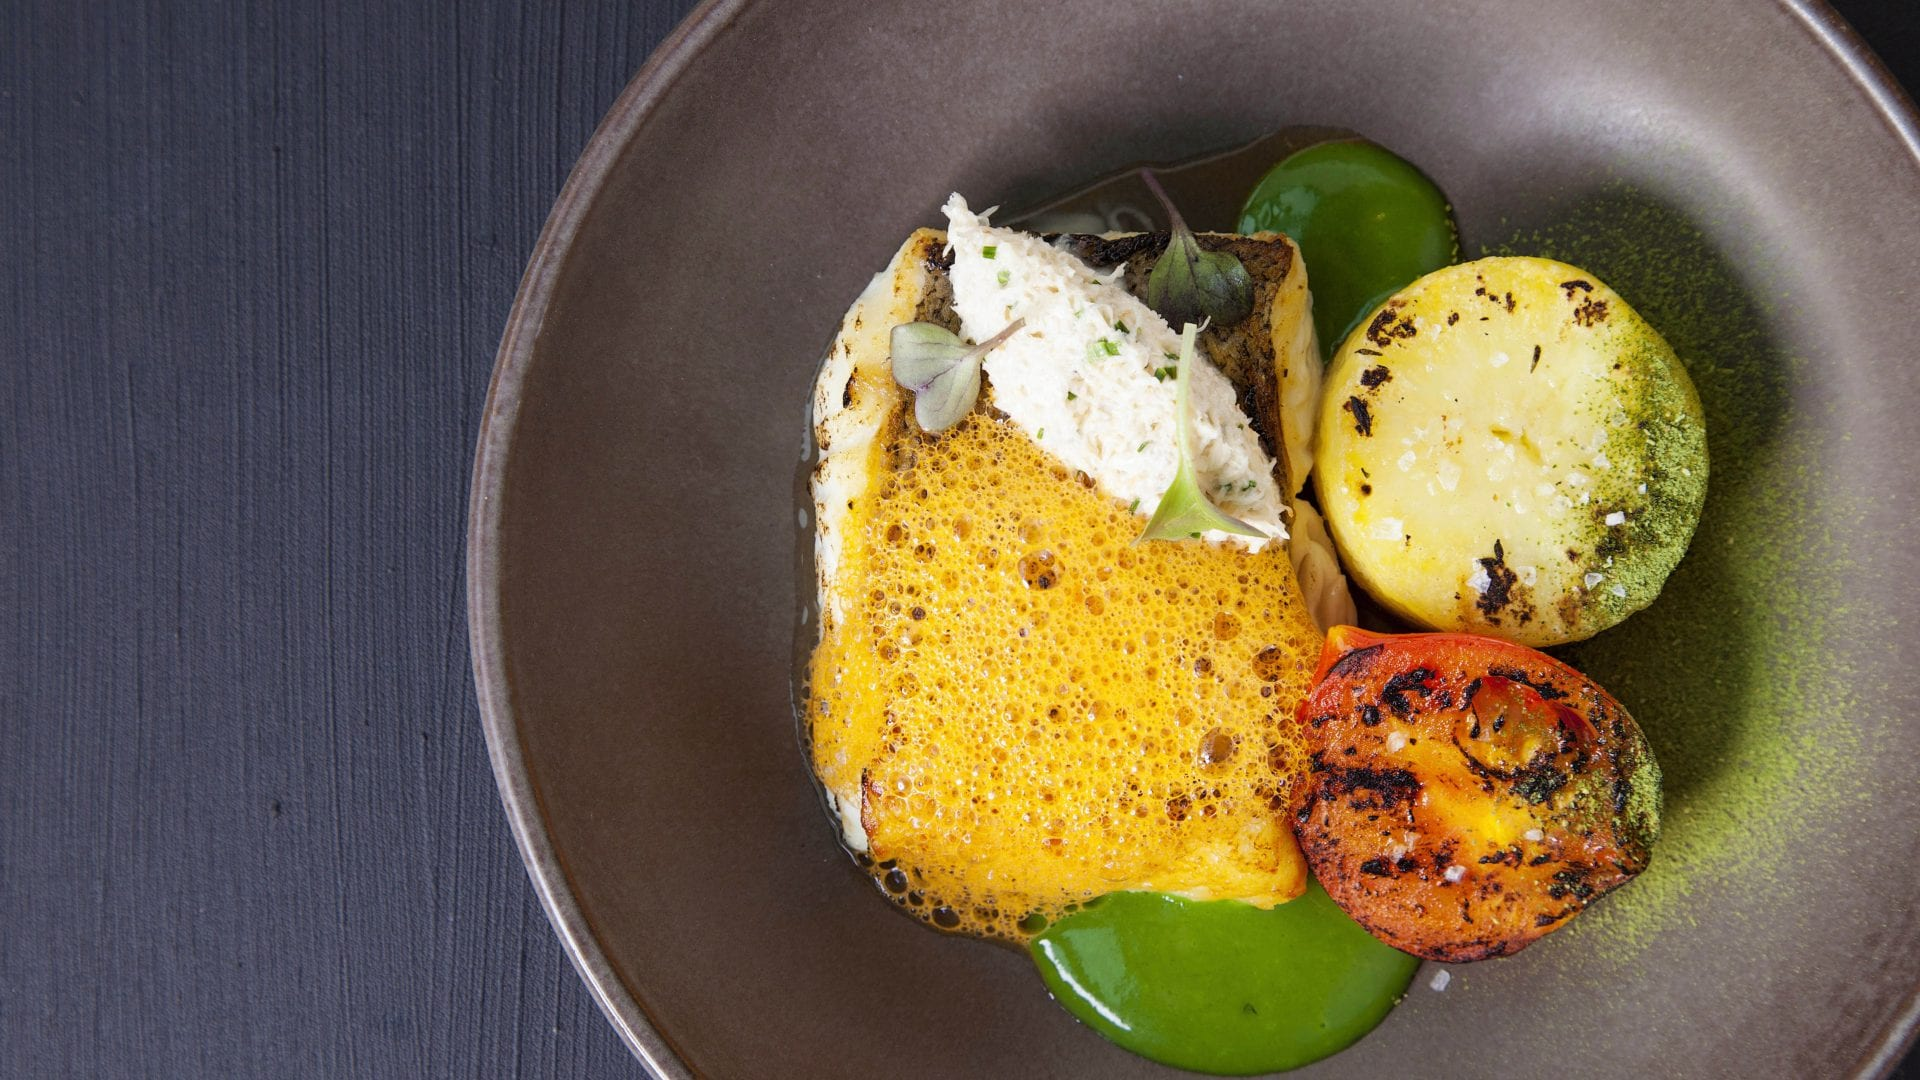 pan-roast hake from coda eatery created by chef igor cikarev at the gibson hotel